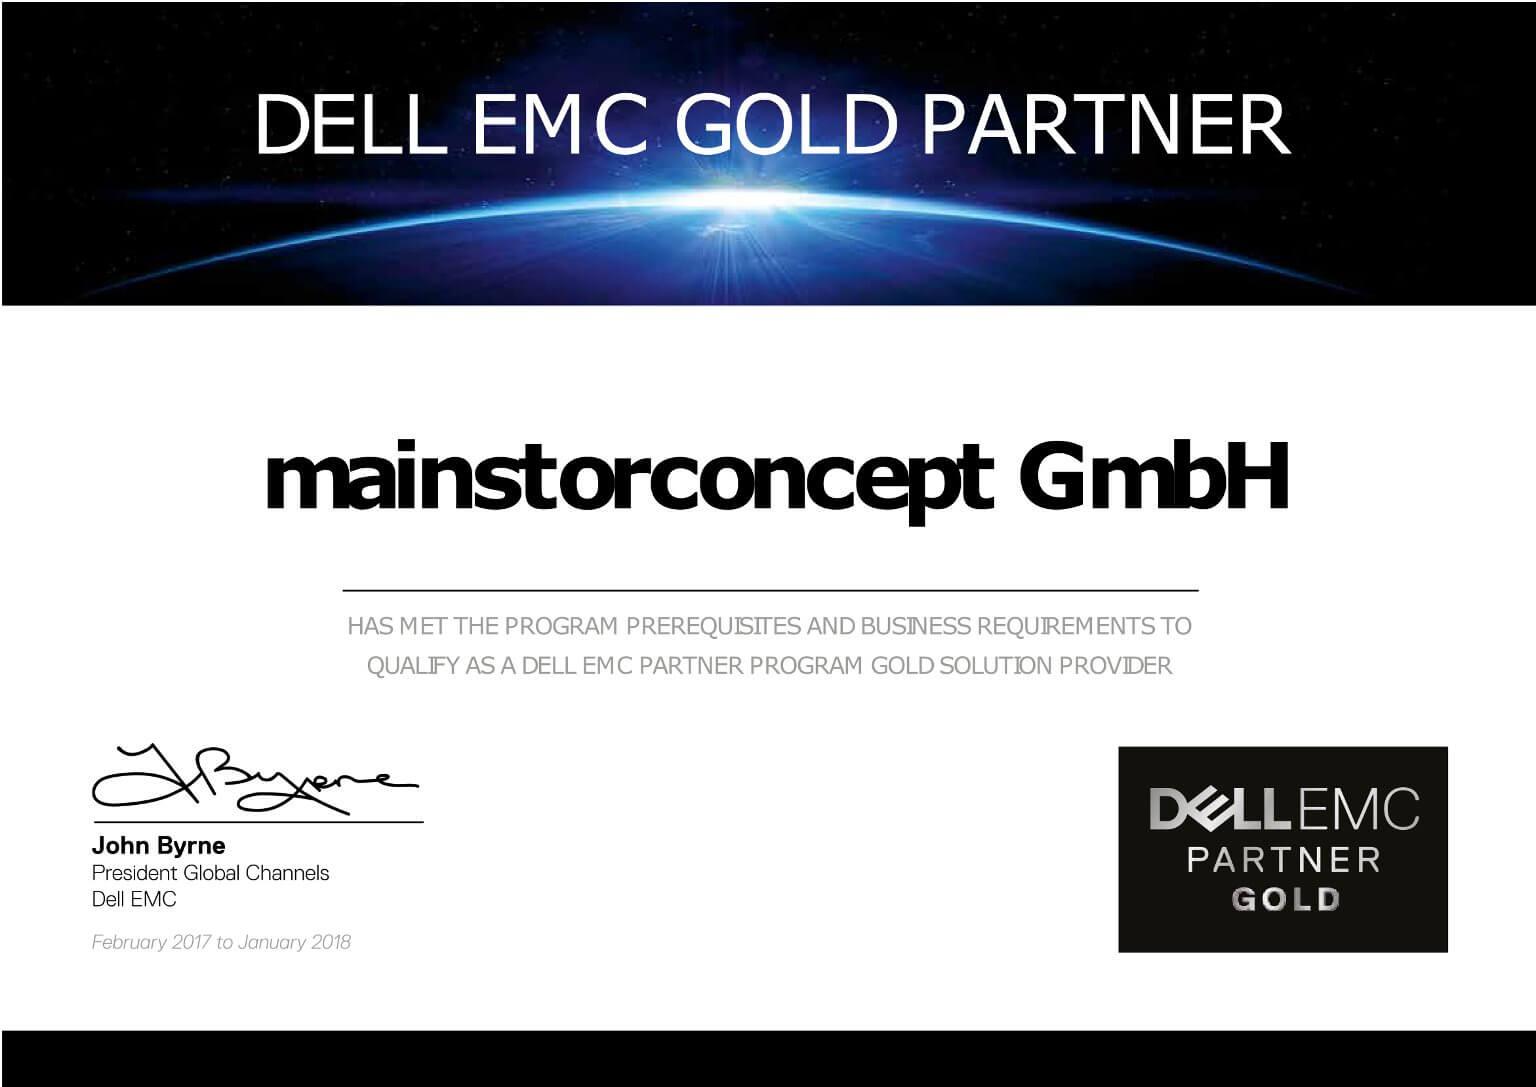 dell emc certificate